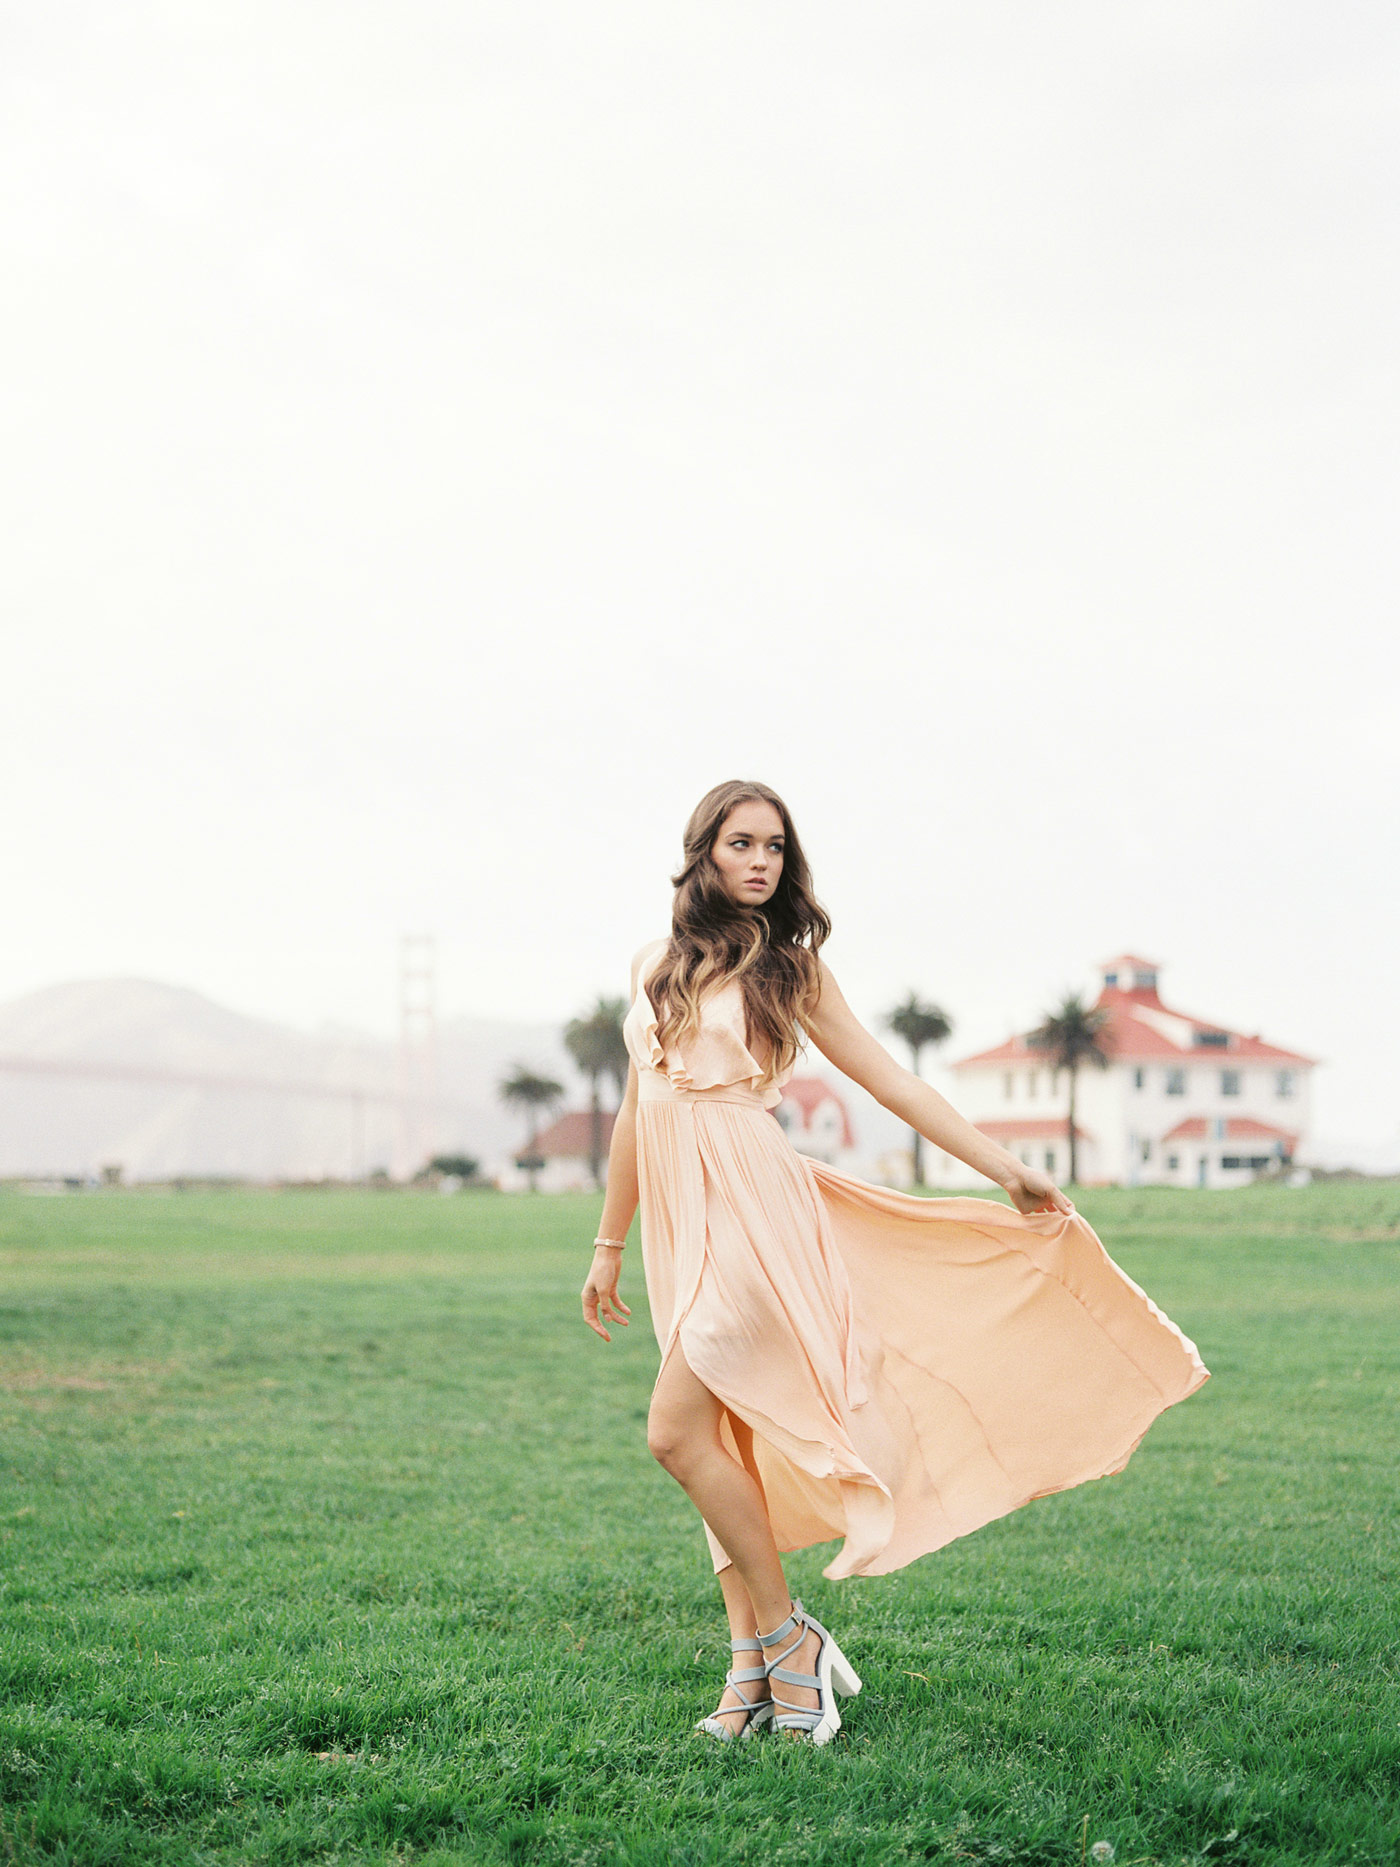 Crissy Field Portrait Photos